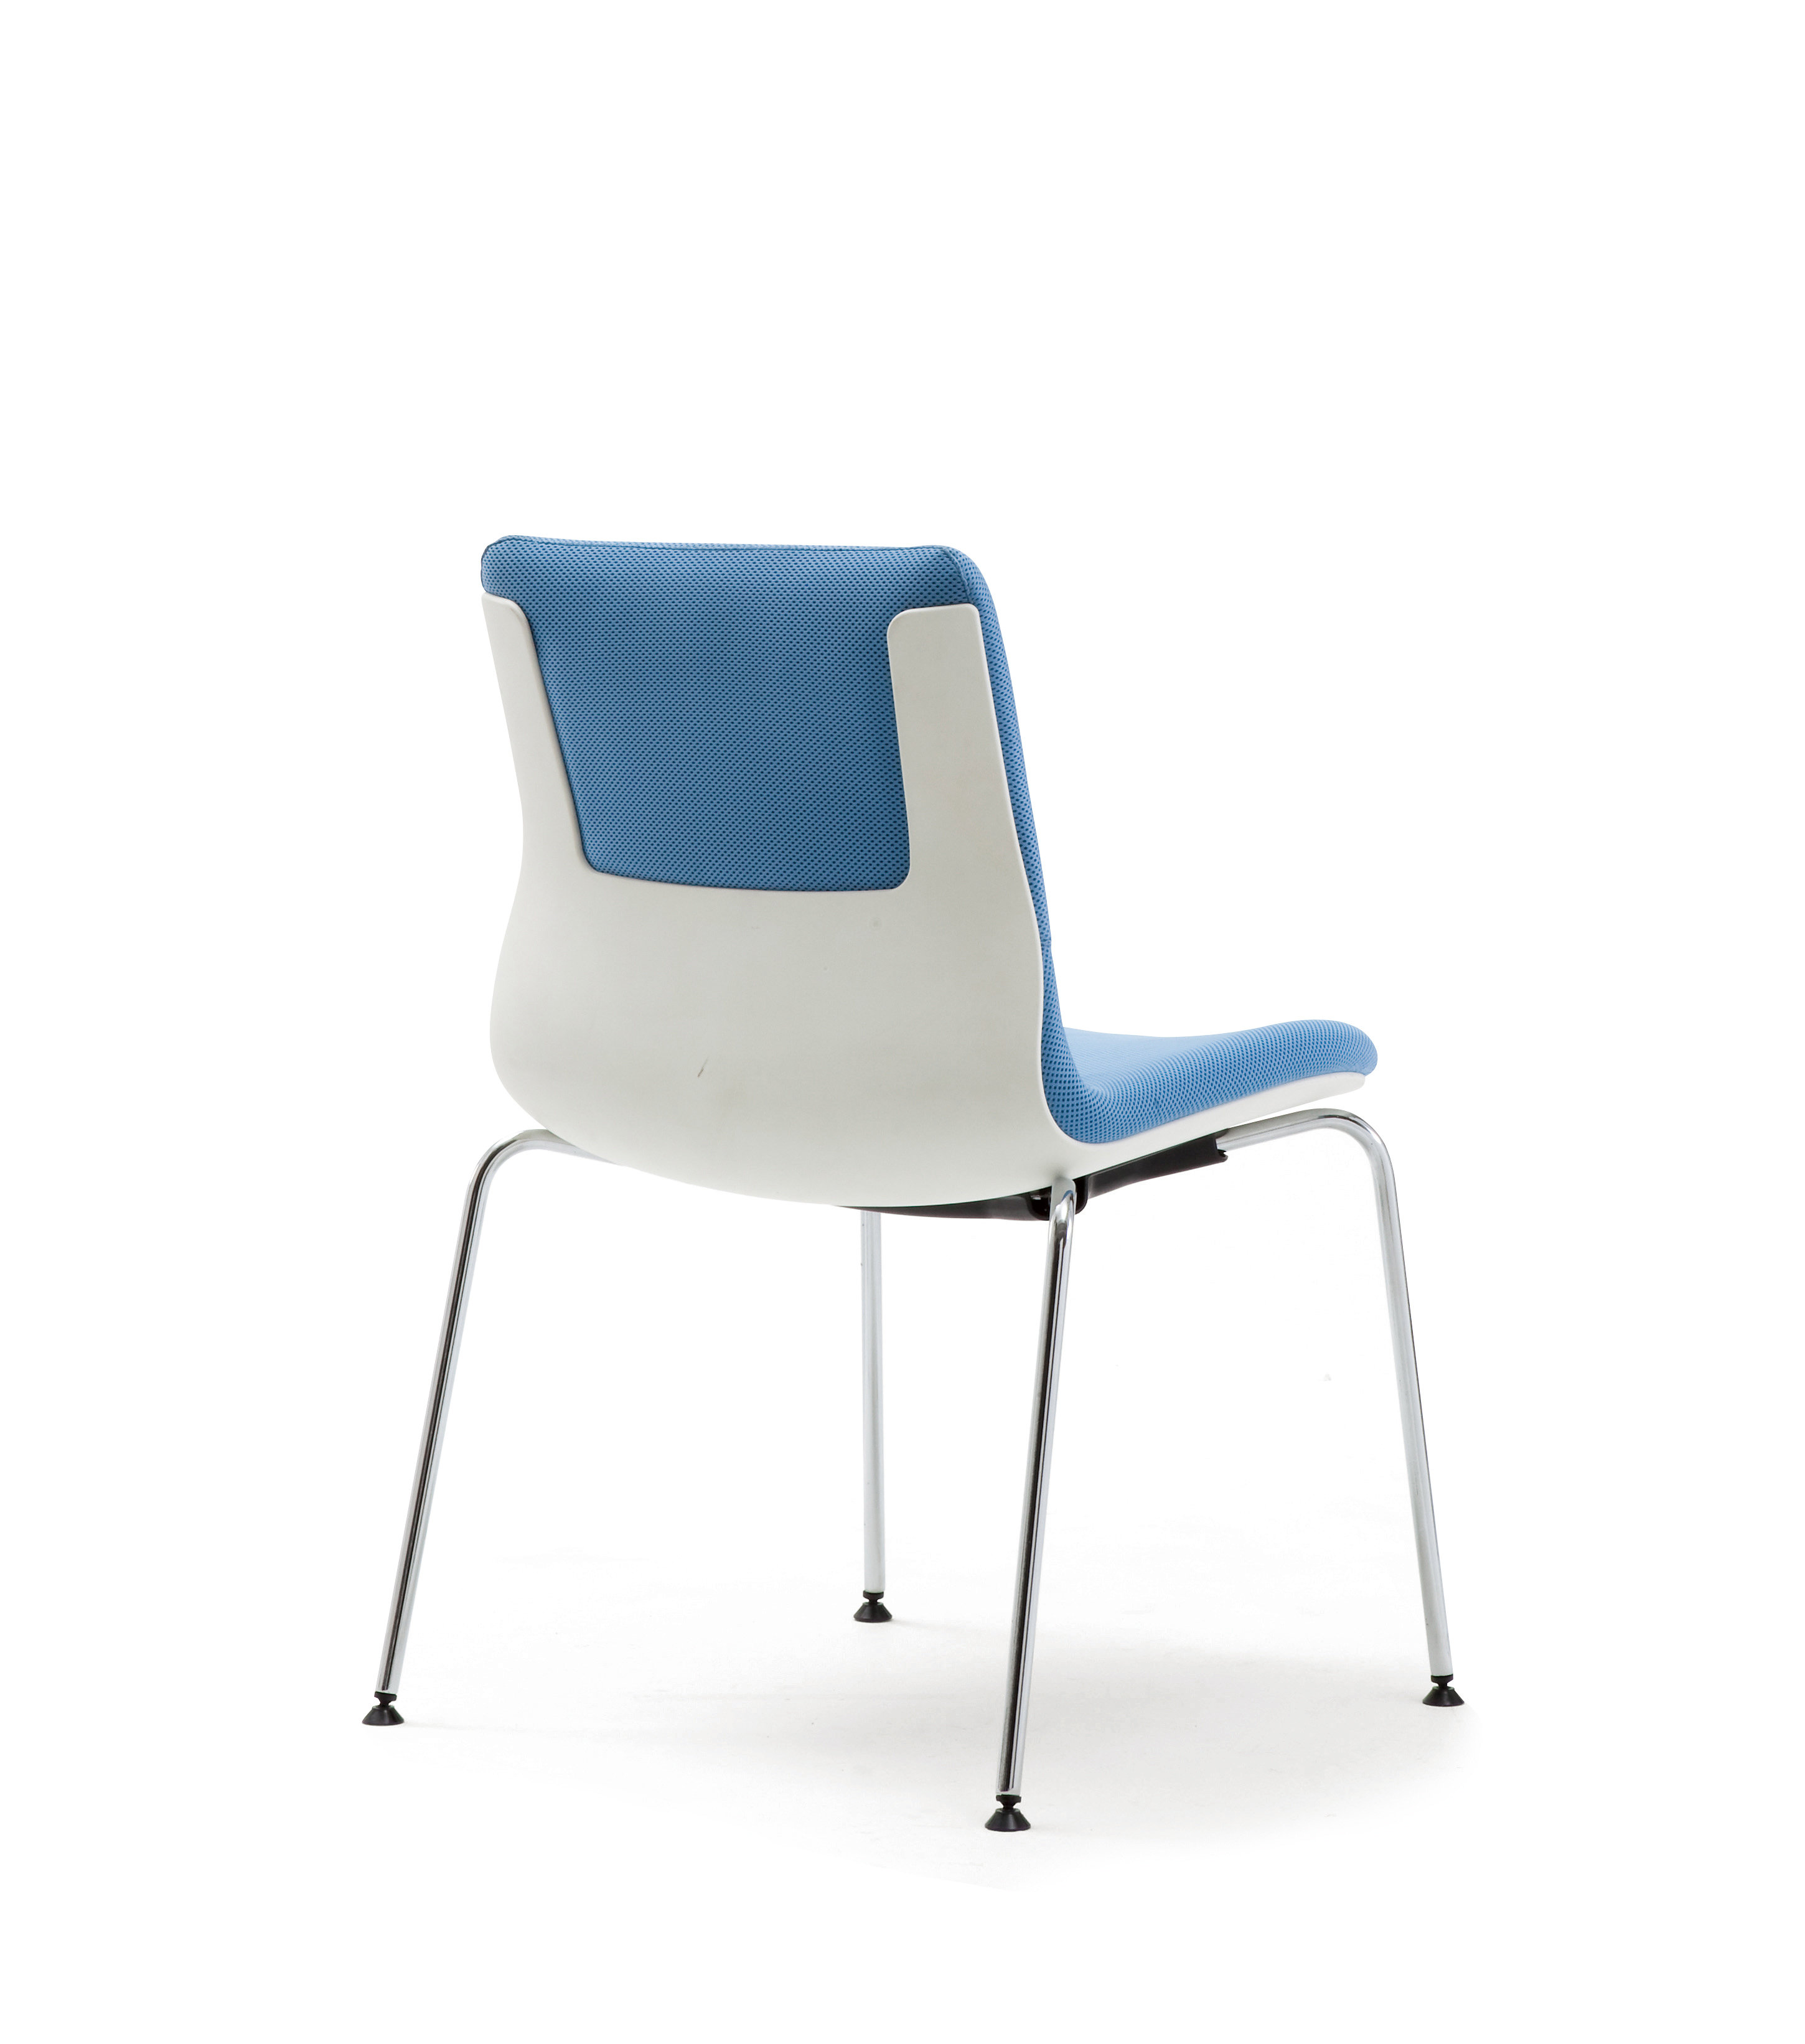 Sidiz EGA 4 Leg Chair